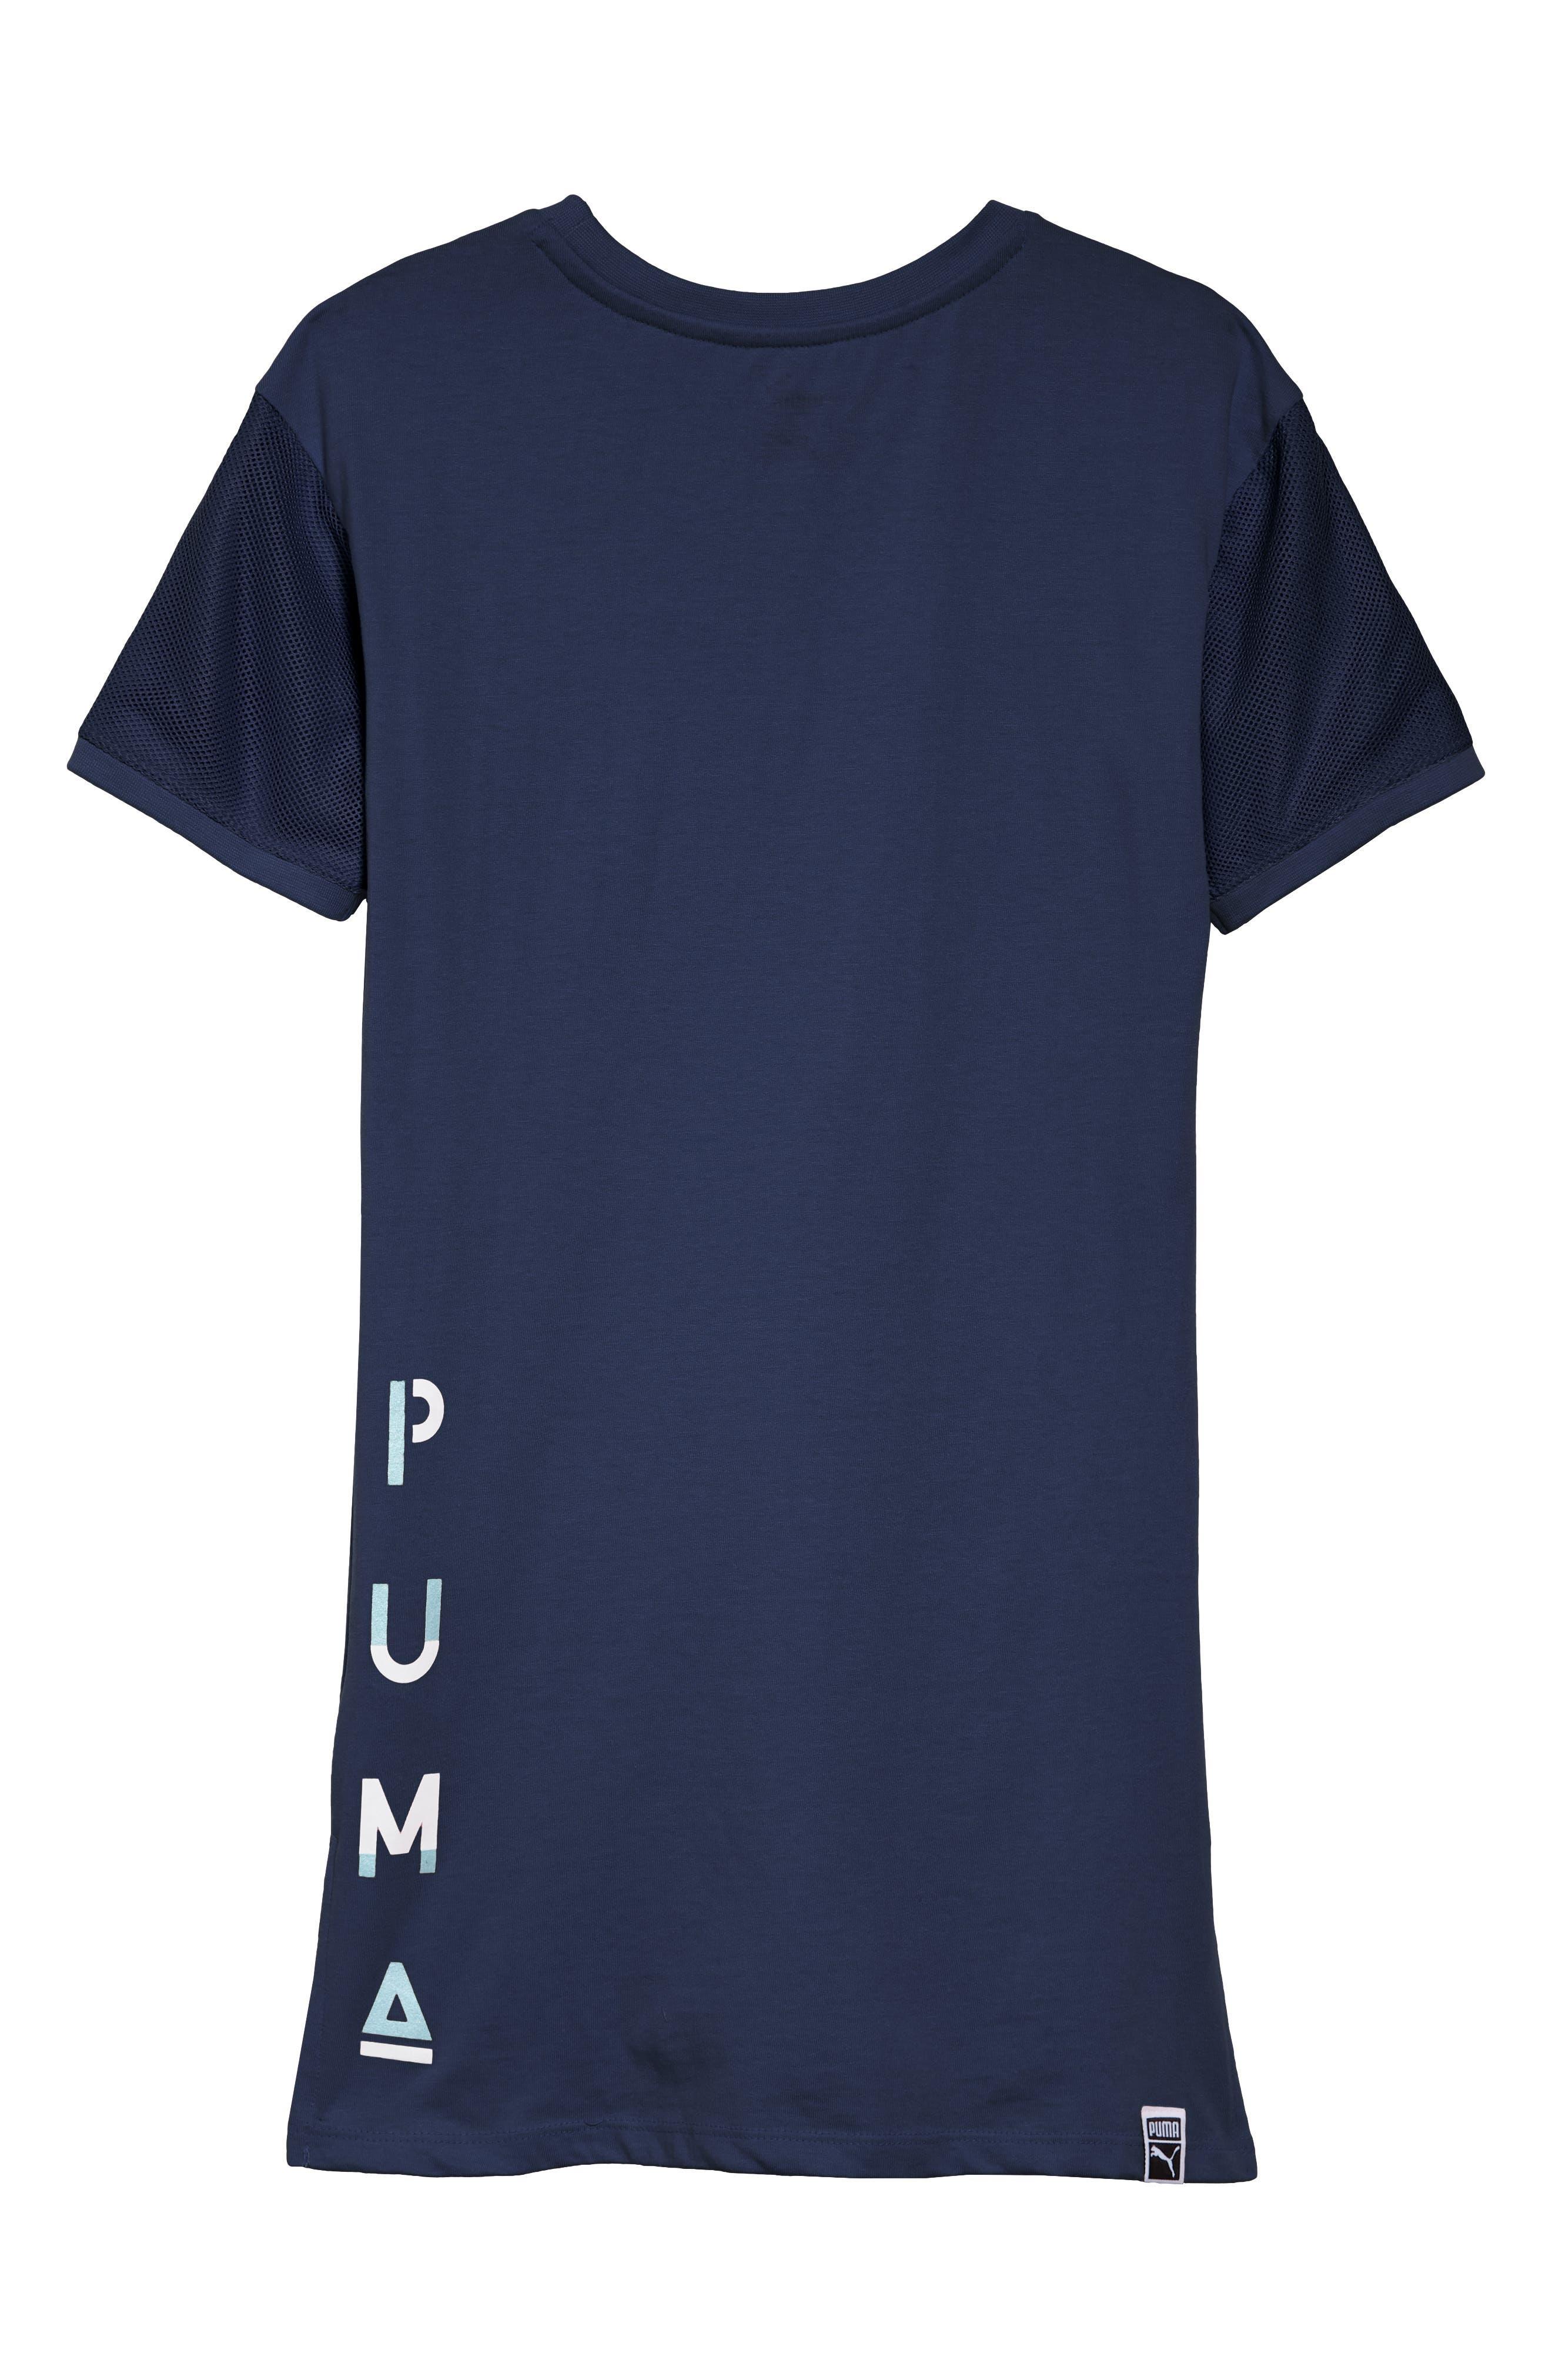 PUMA,                             Logo T-Shirt Dress,                             Alternate thumbnail 2, color,                             404